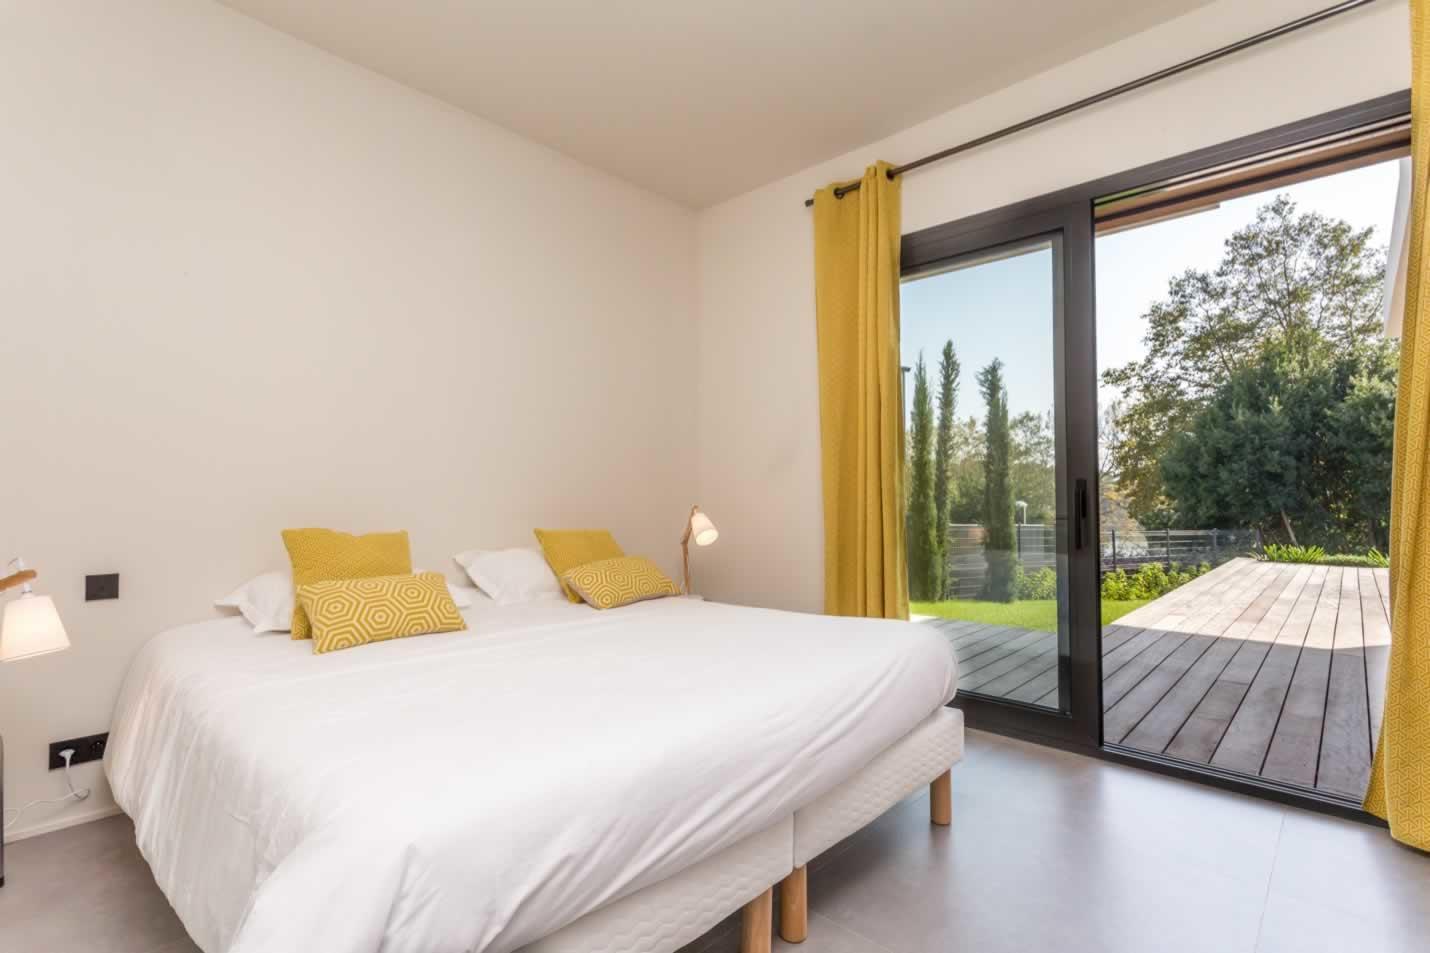 Beautiful Bed Rooms Pics